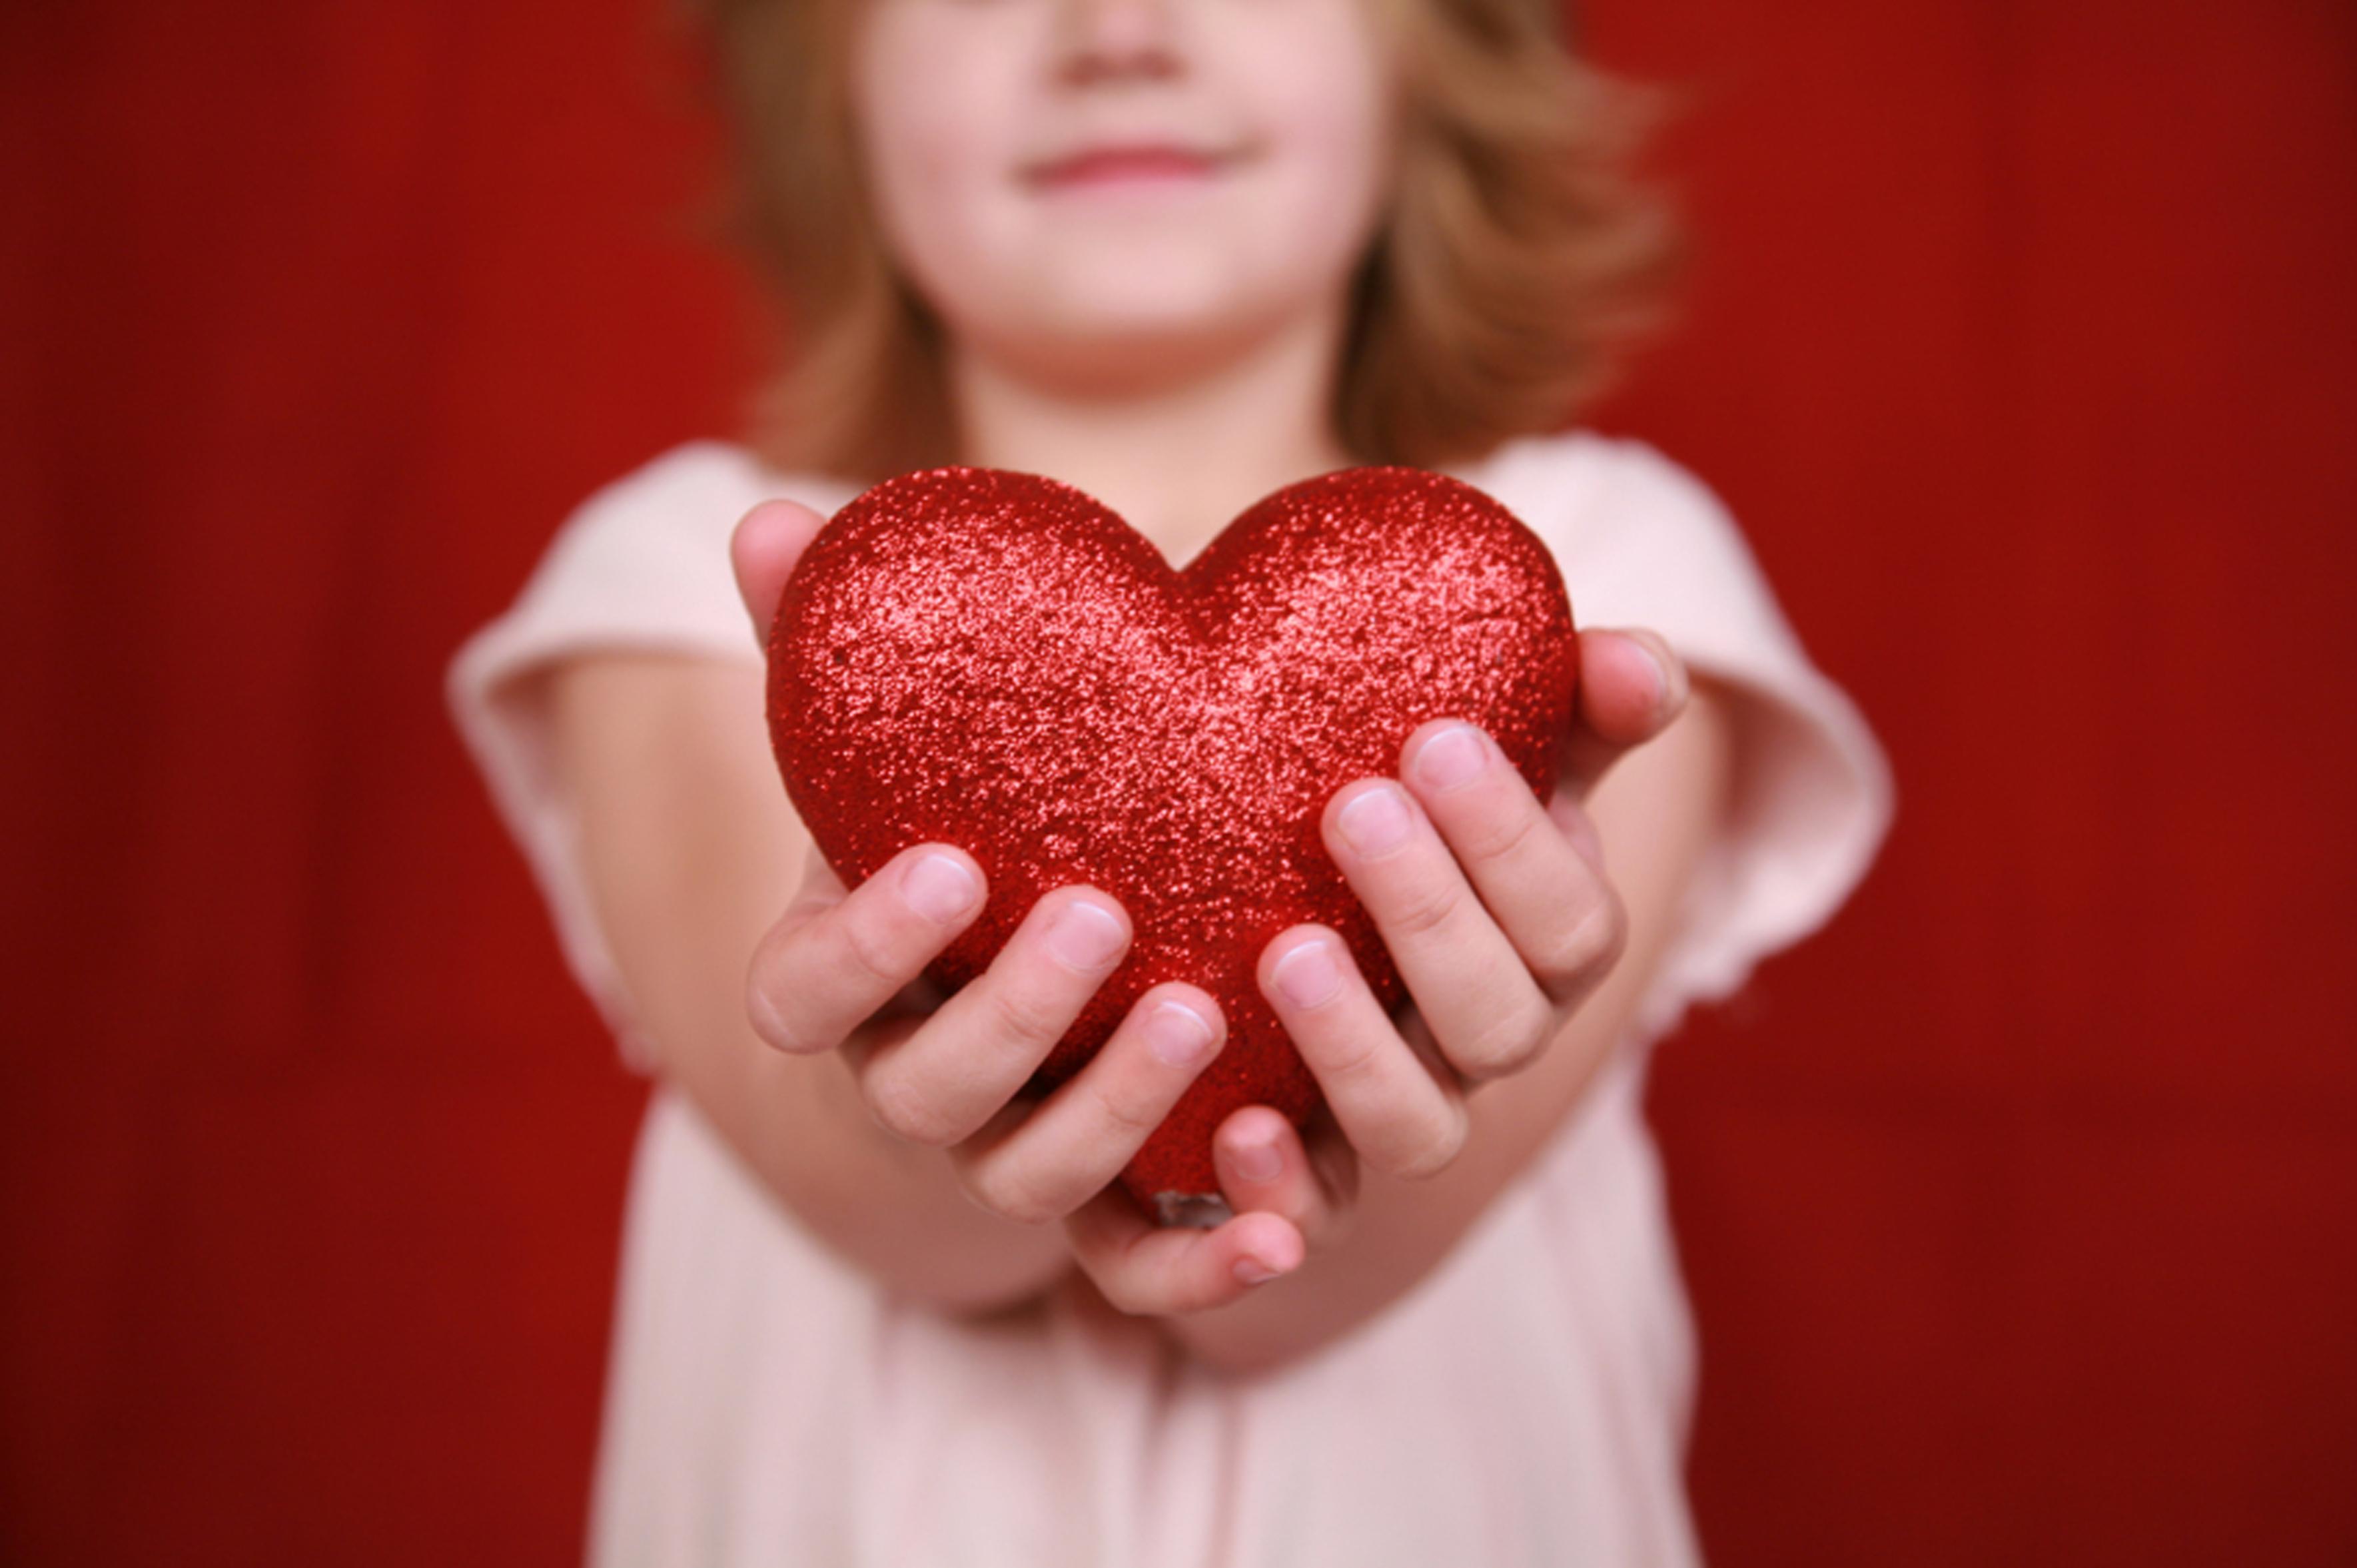 childholdingheartret